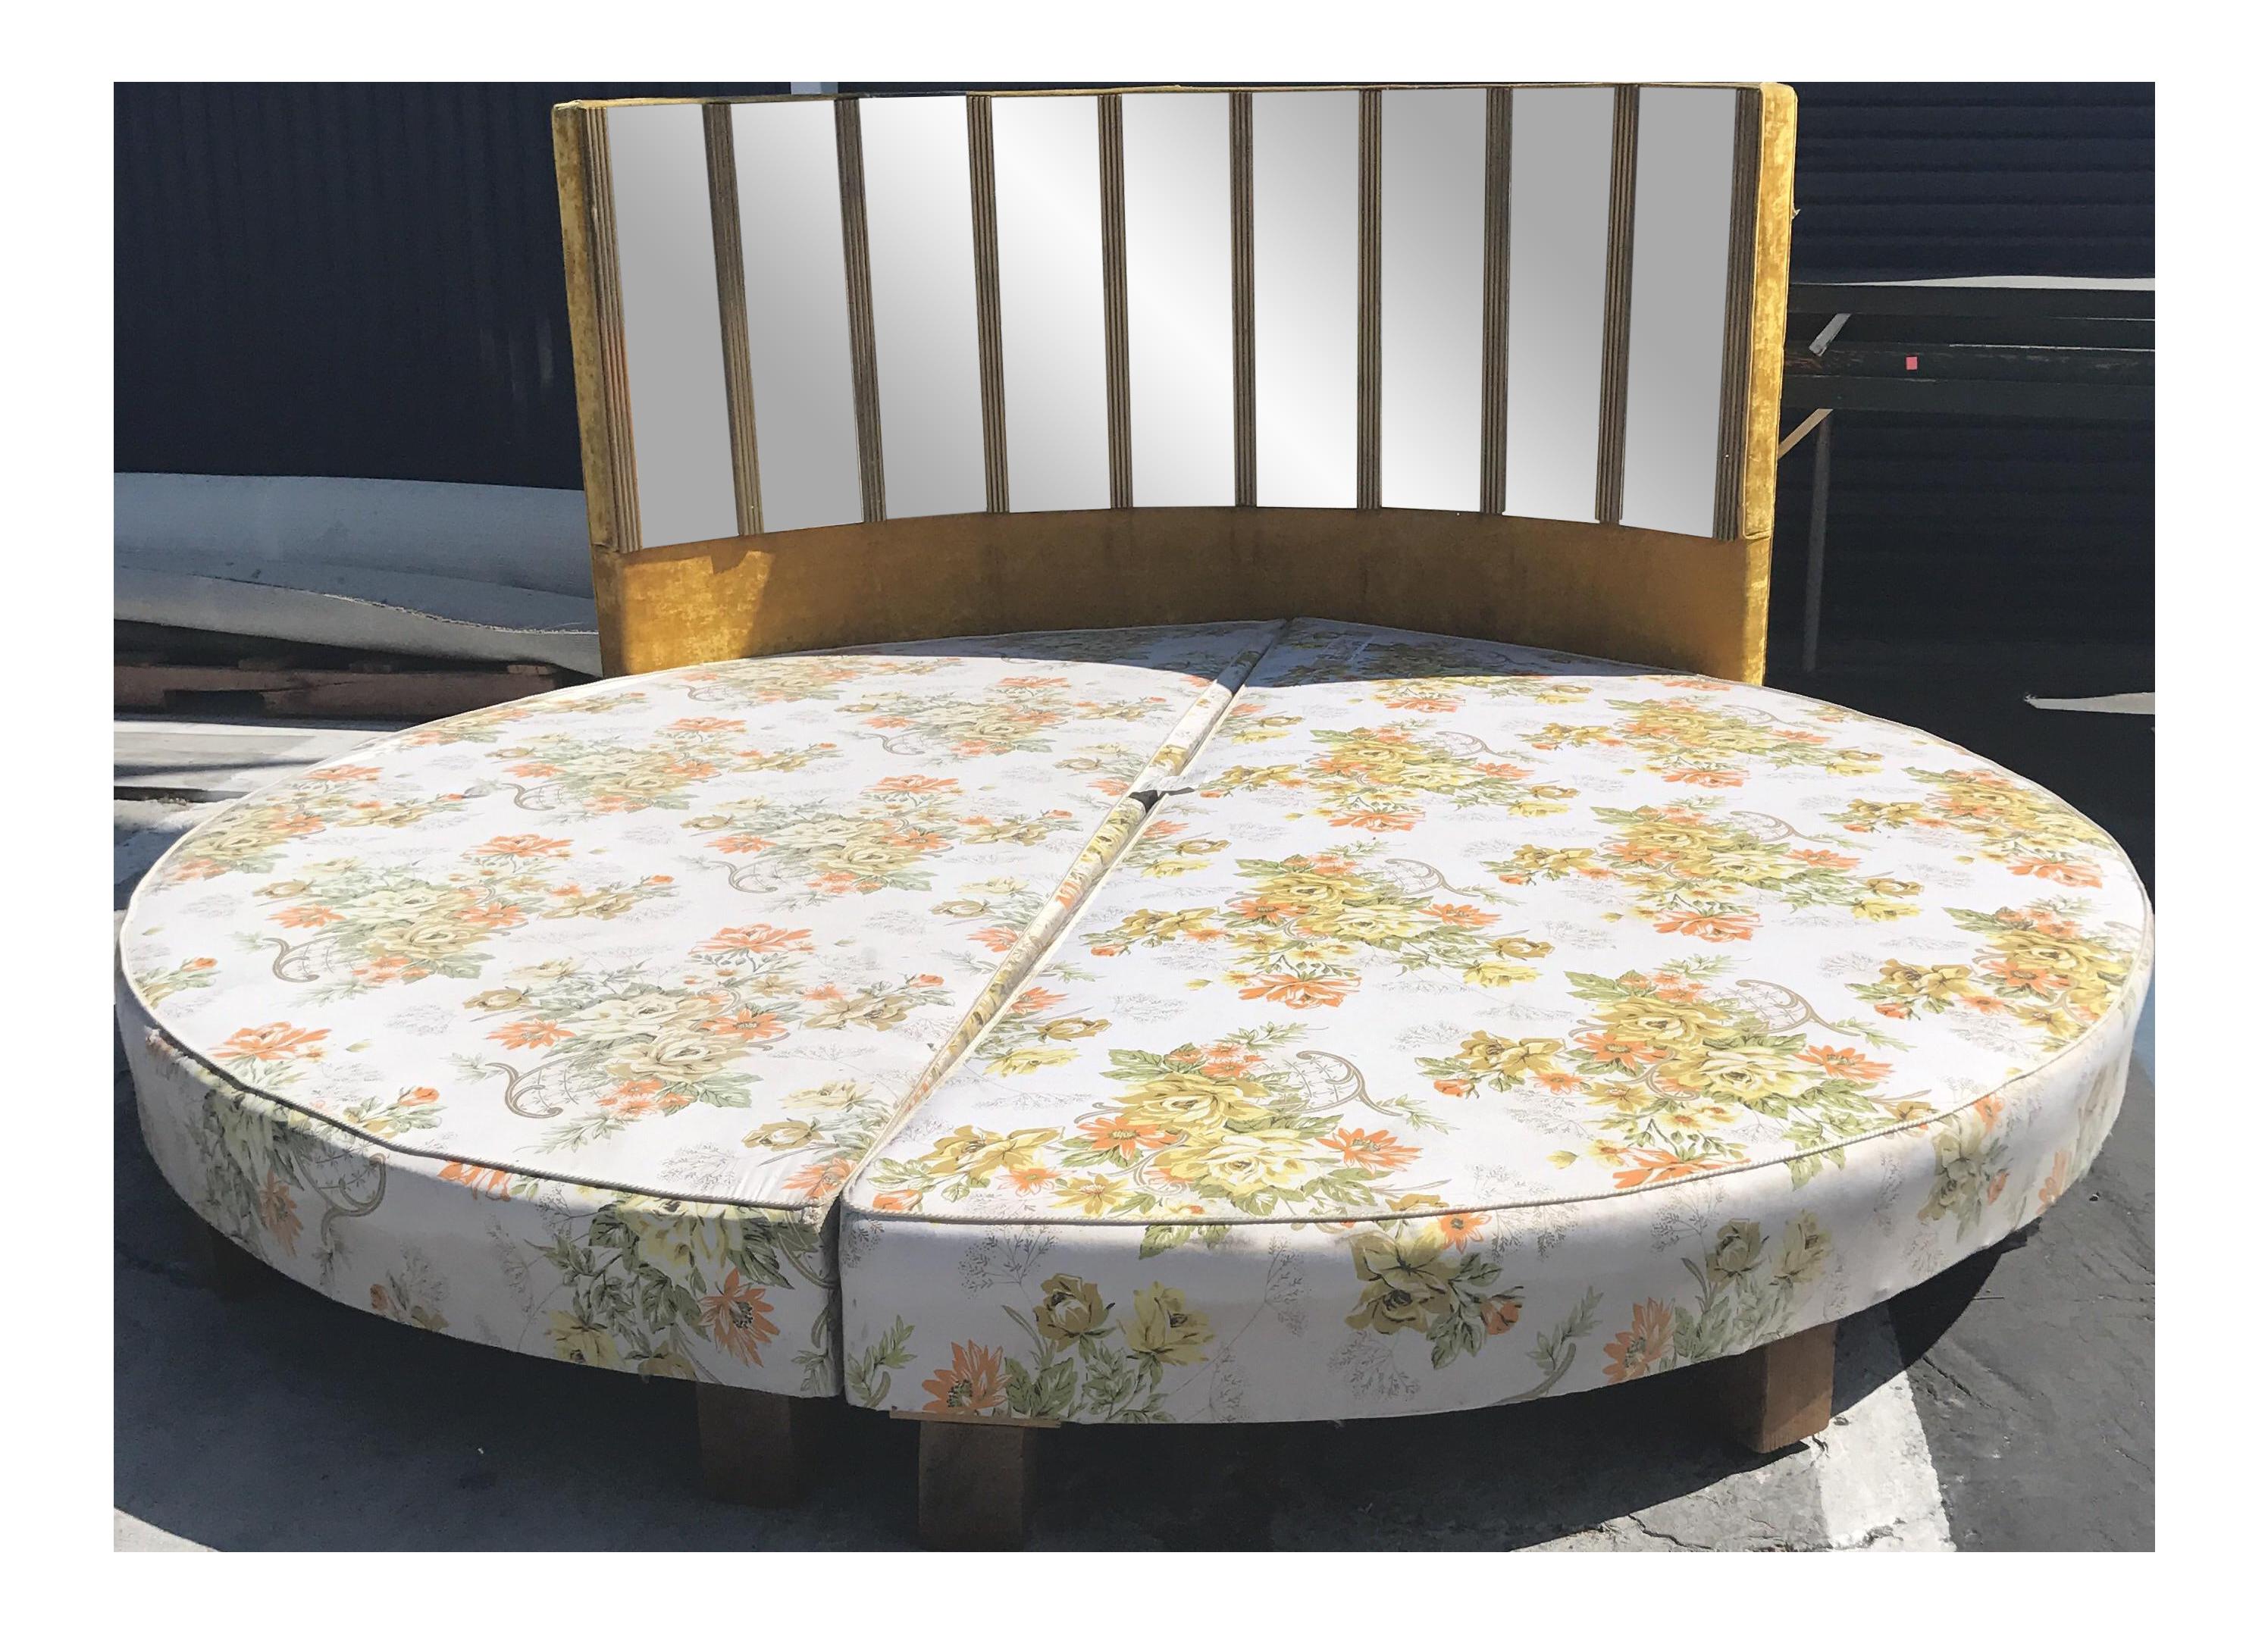 Best Hollywood Regency Round Bed Round Beds Bed Bed Frame 400 x 300